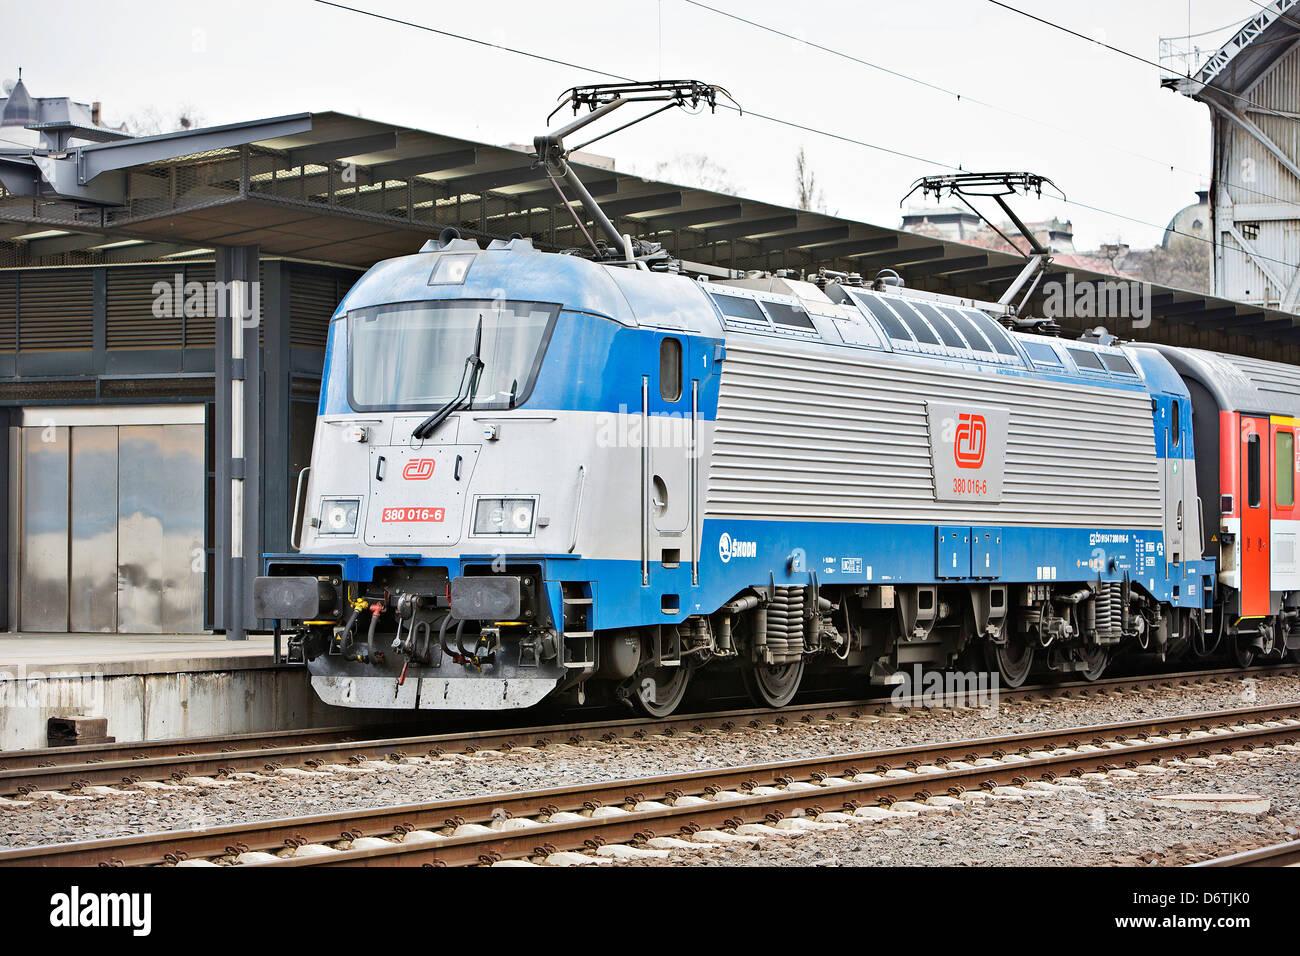 Skoda 109 E multi-system electric locomotive is seen in Prague Czech Republic on Thursday April 18 2013 Czech rolling - Stock Image